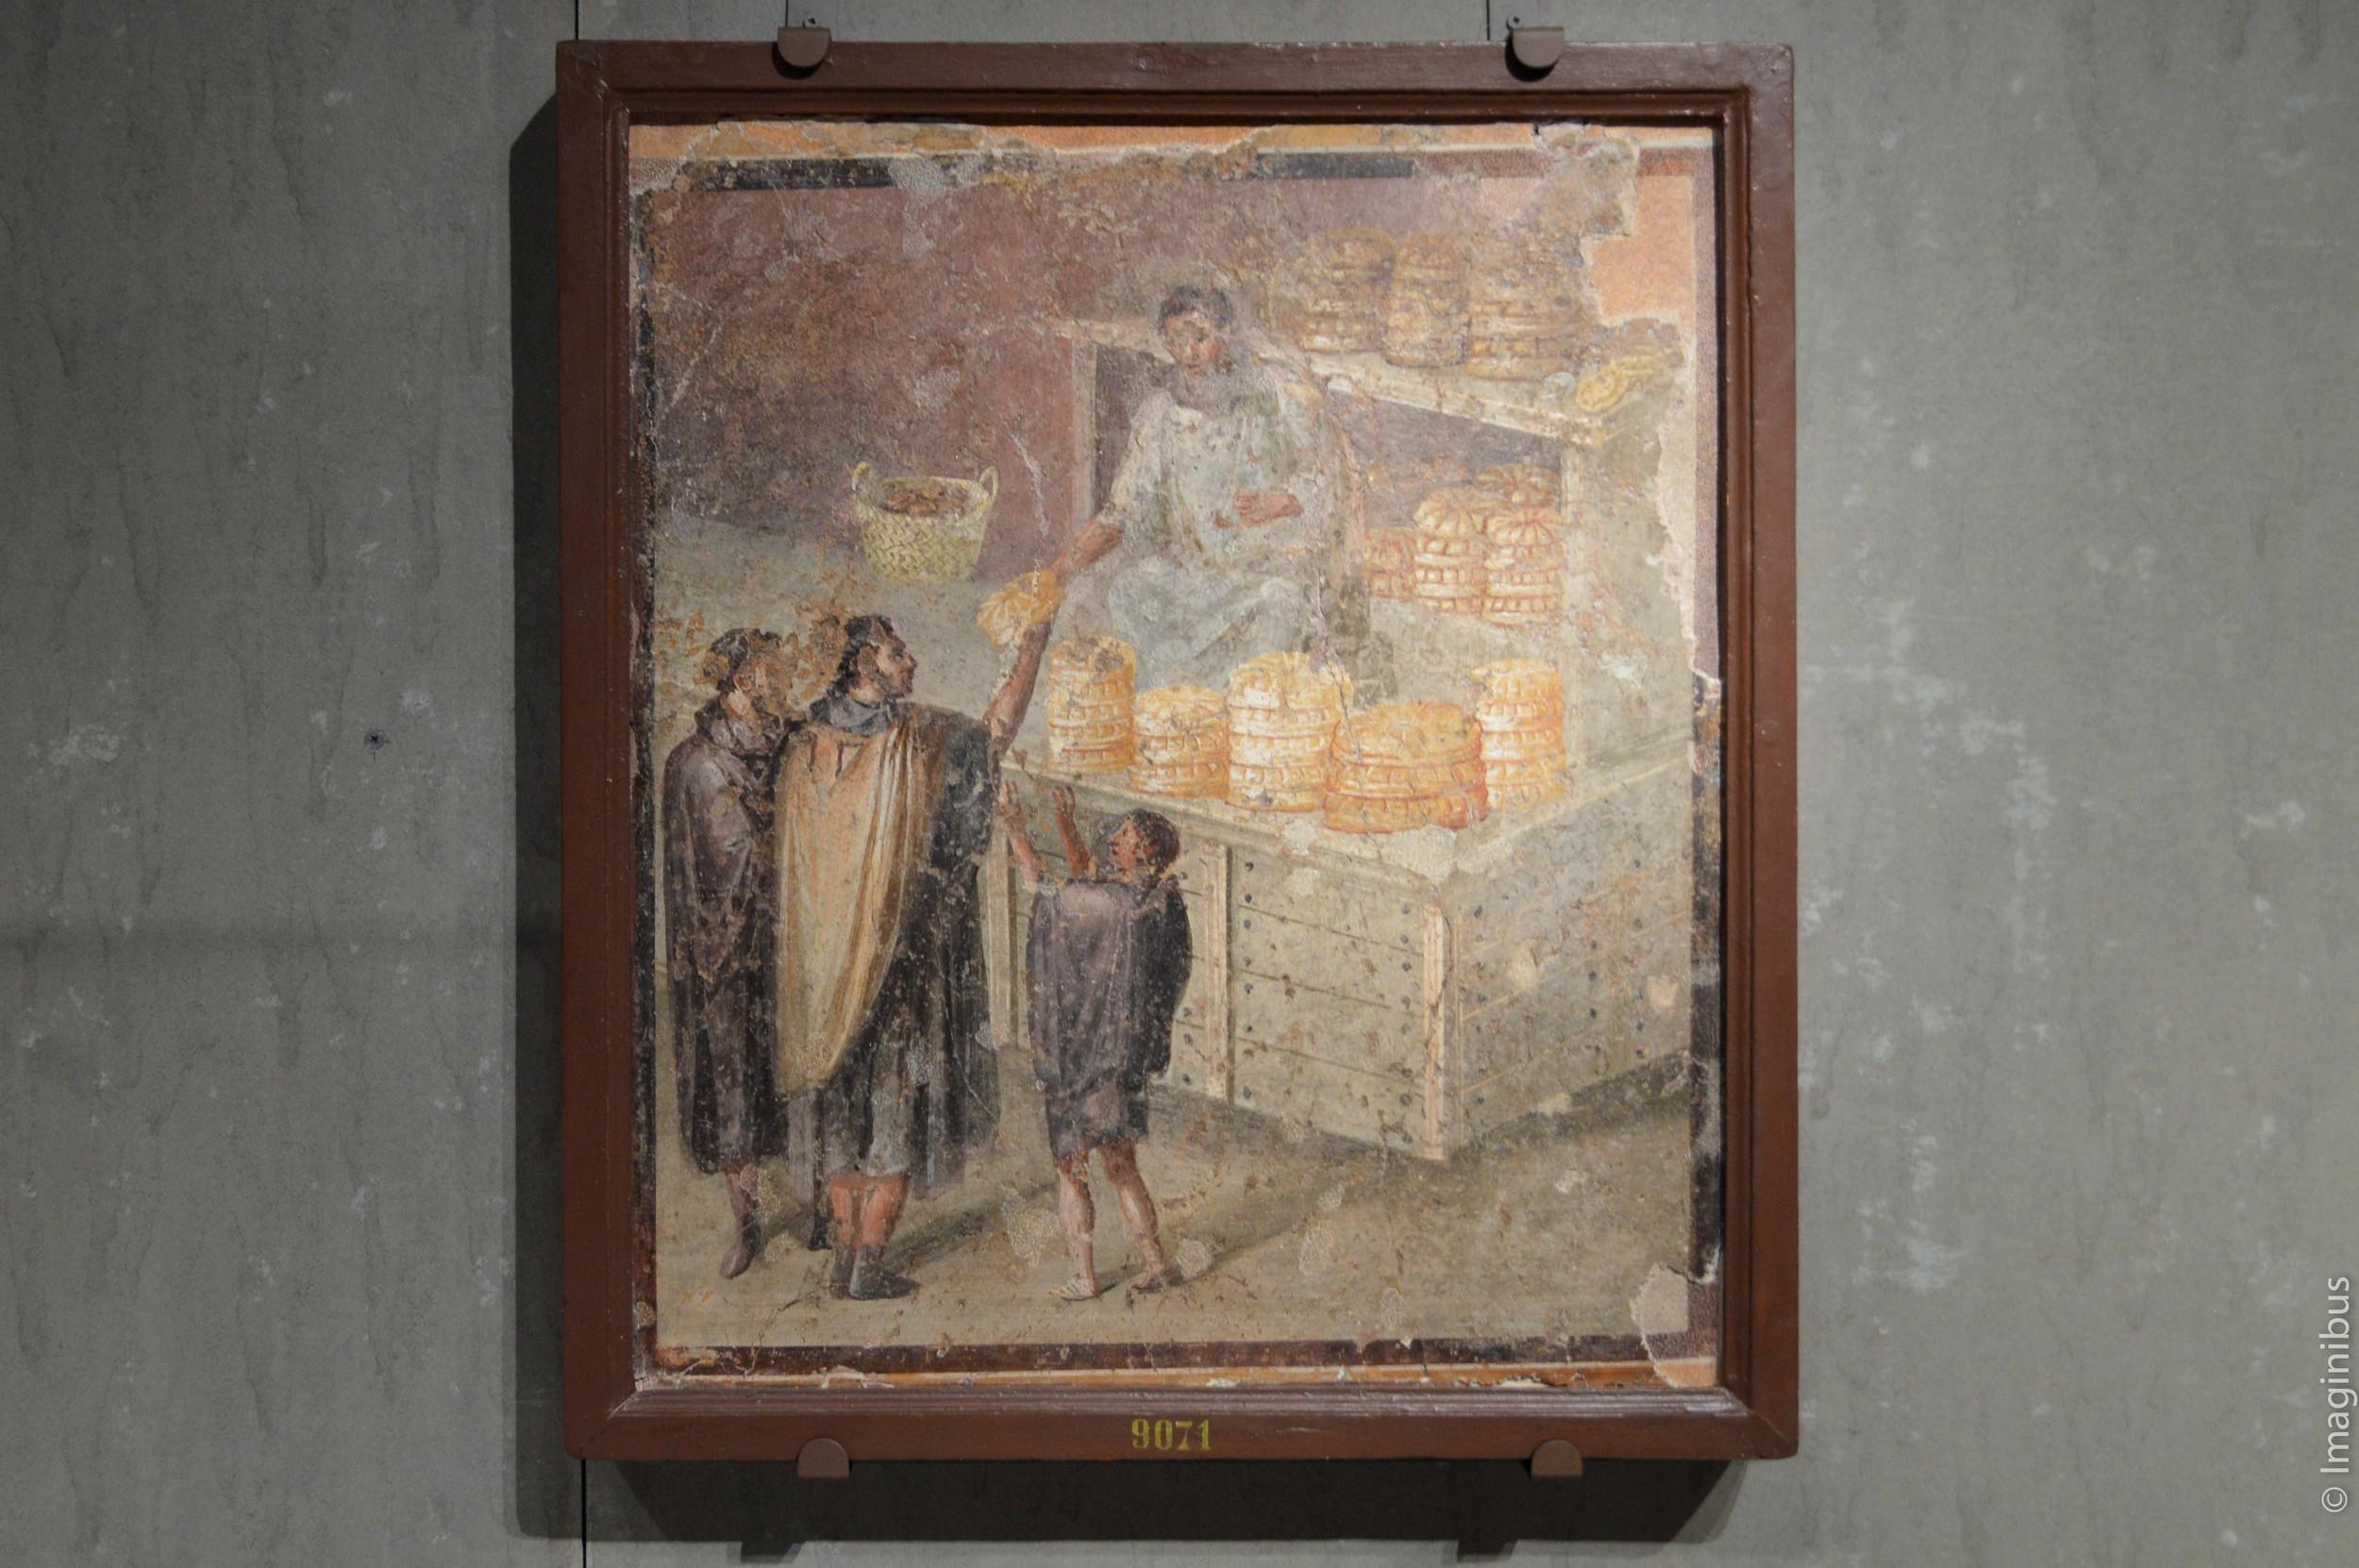 Pompeii, Montreal Museum of Fine Arts, Politician